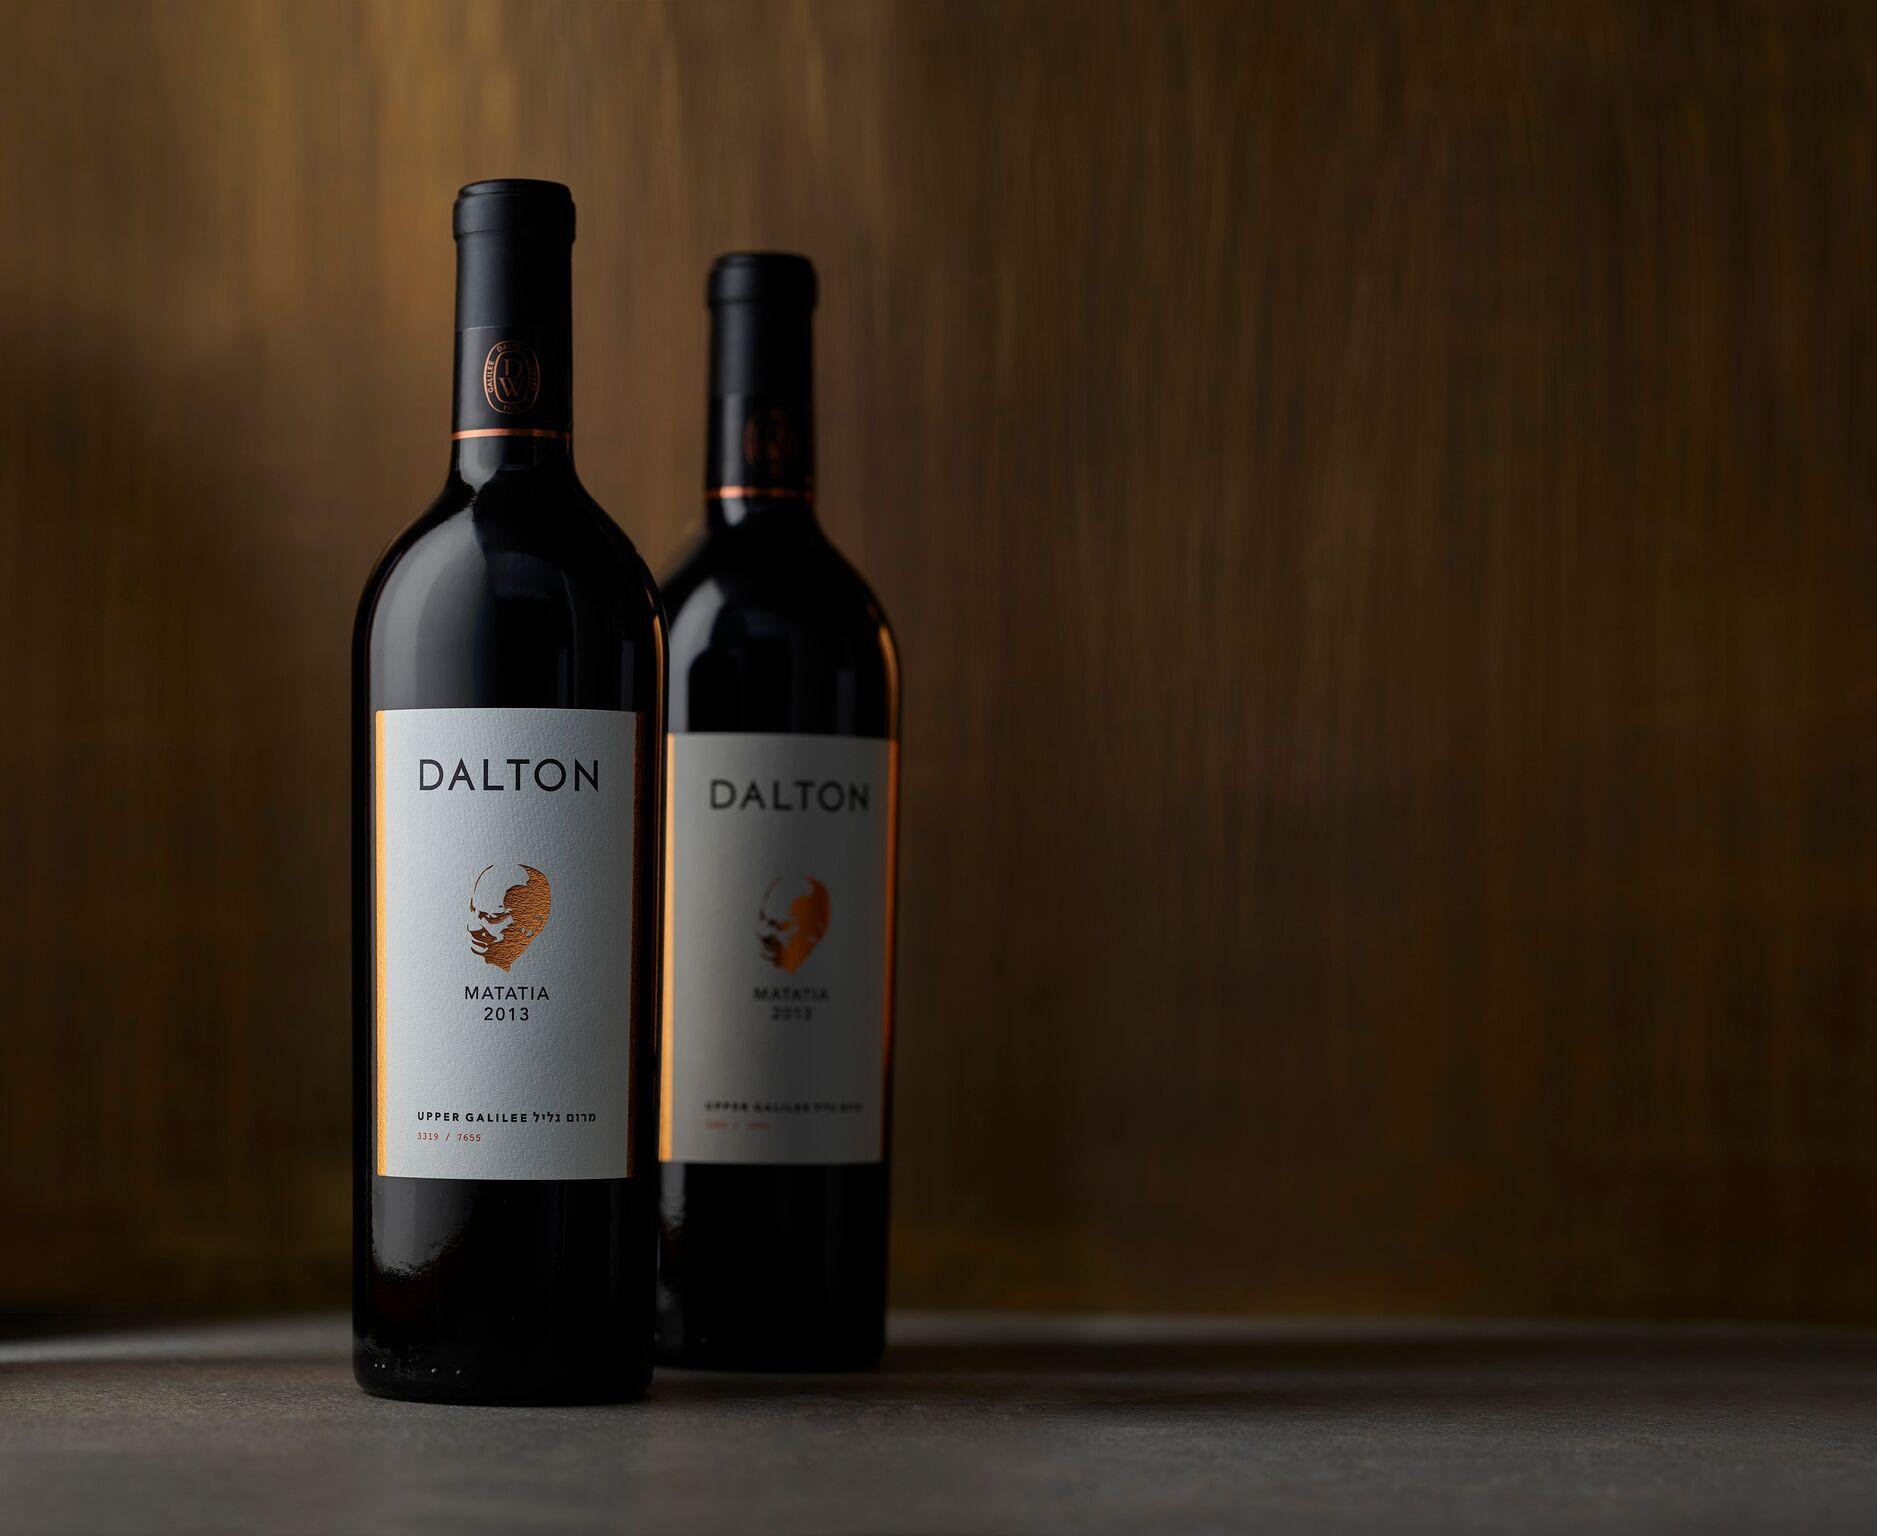 Cellar Master Wine Club at KosherWine.com